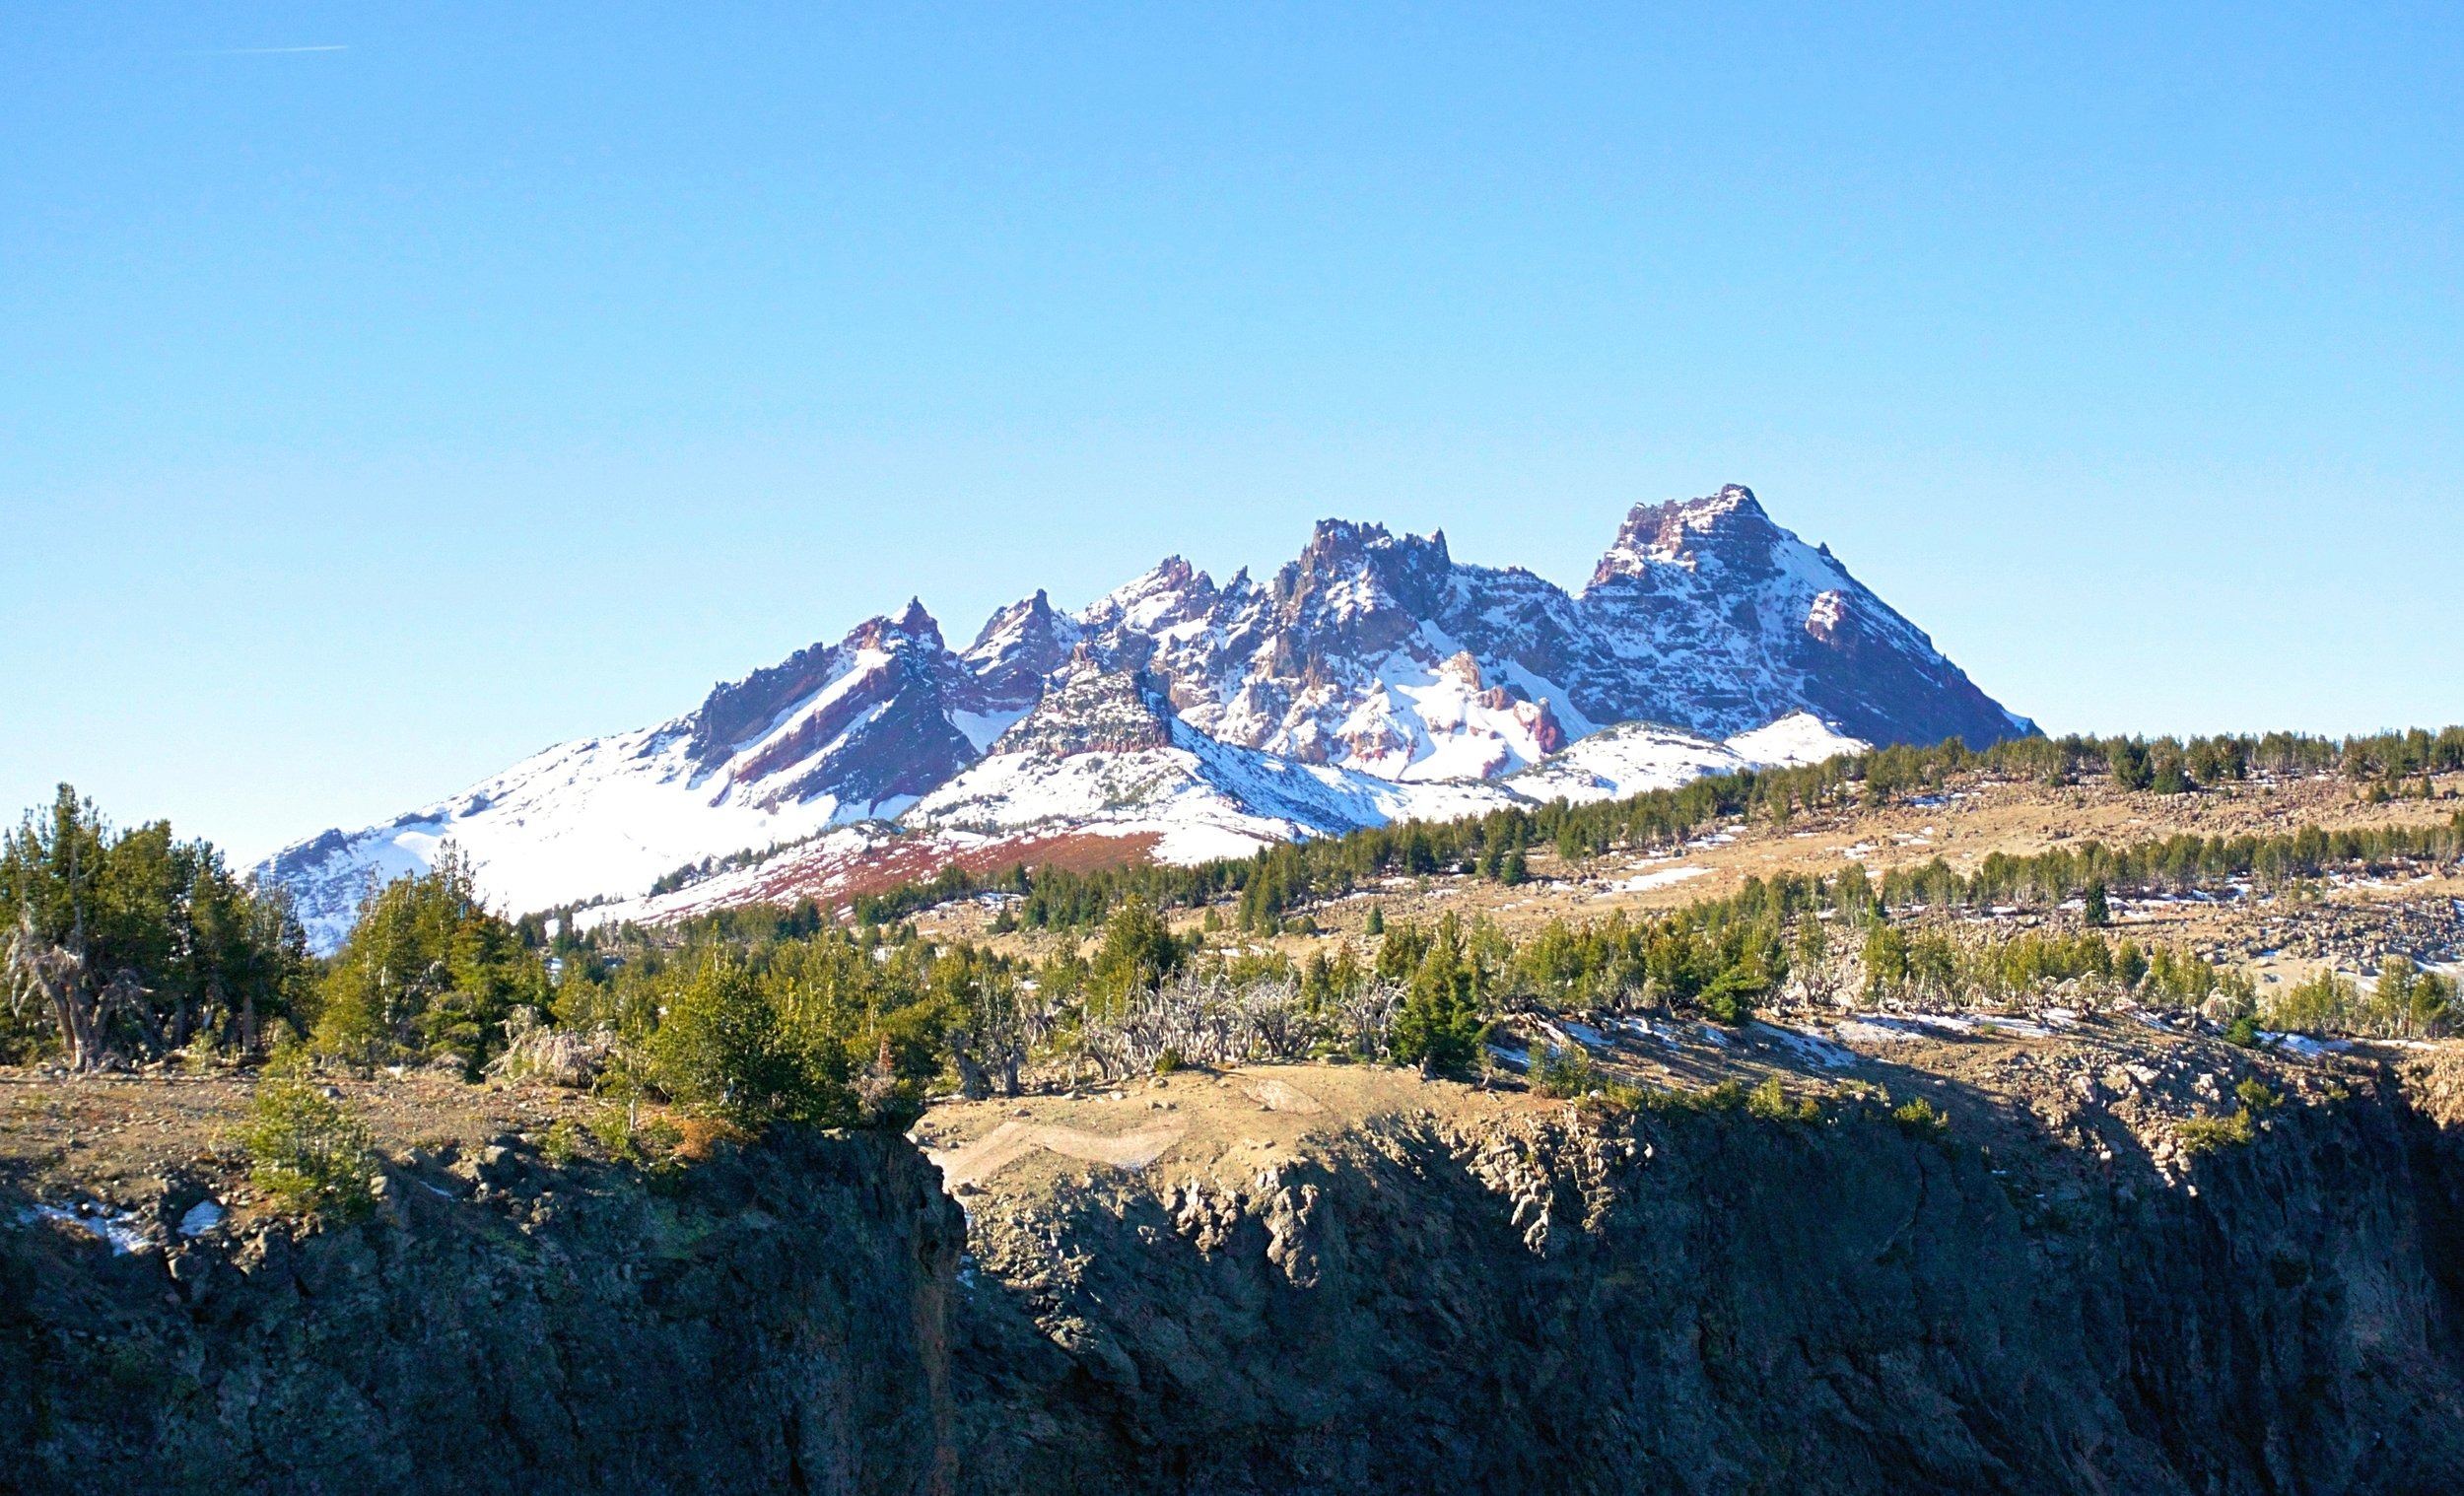 Tam McArthur Trail, Bend Oregon